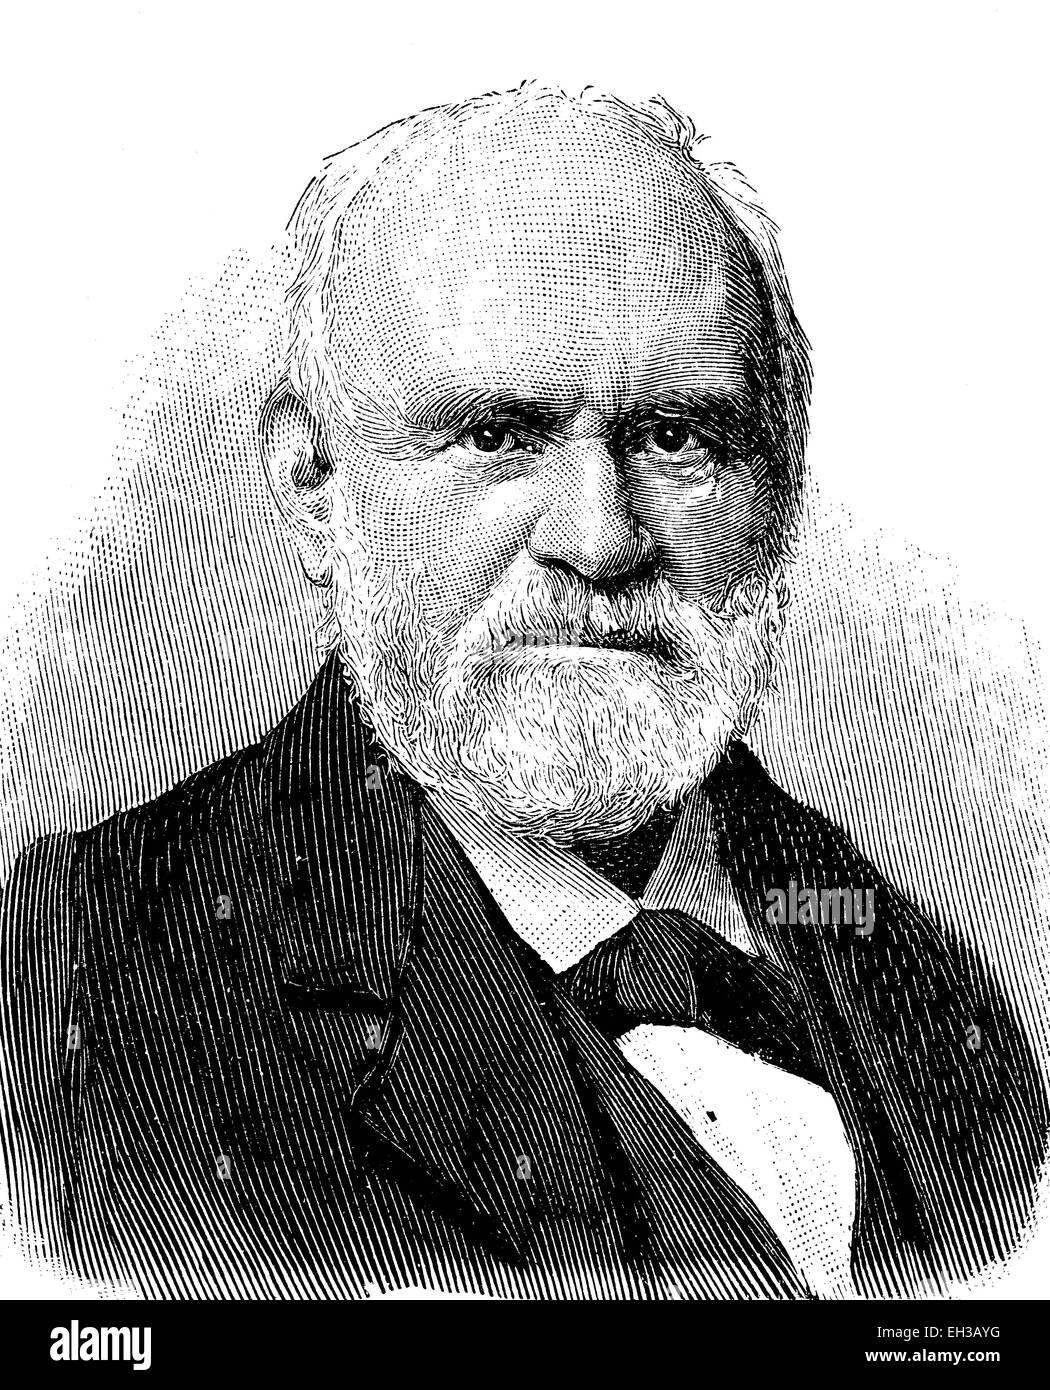 Johann Samuel Heinrich Kiepert, 1818 - 1899, German geographer and cartographer, wood engraving, 1880 - Stock Image